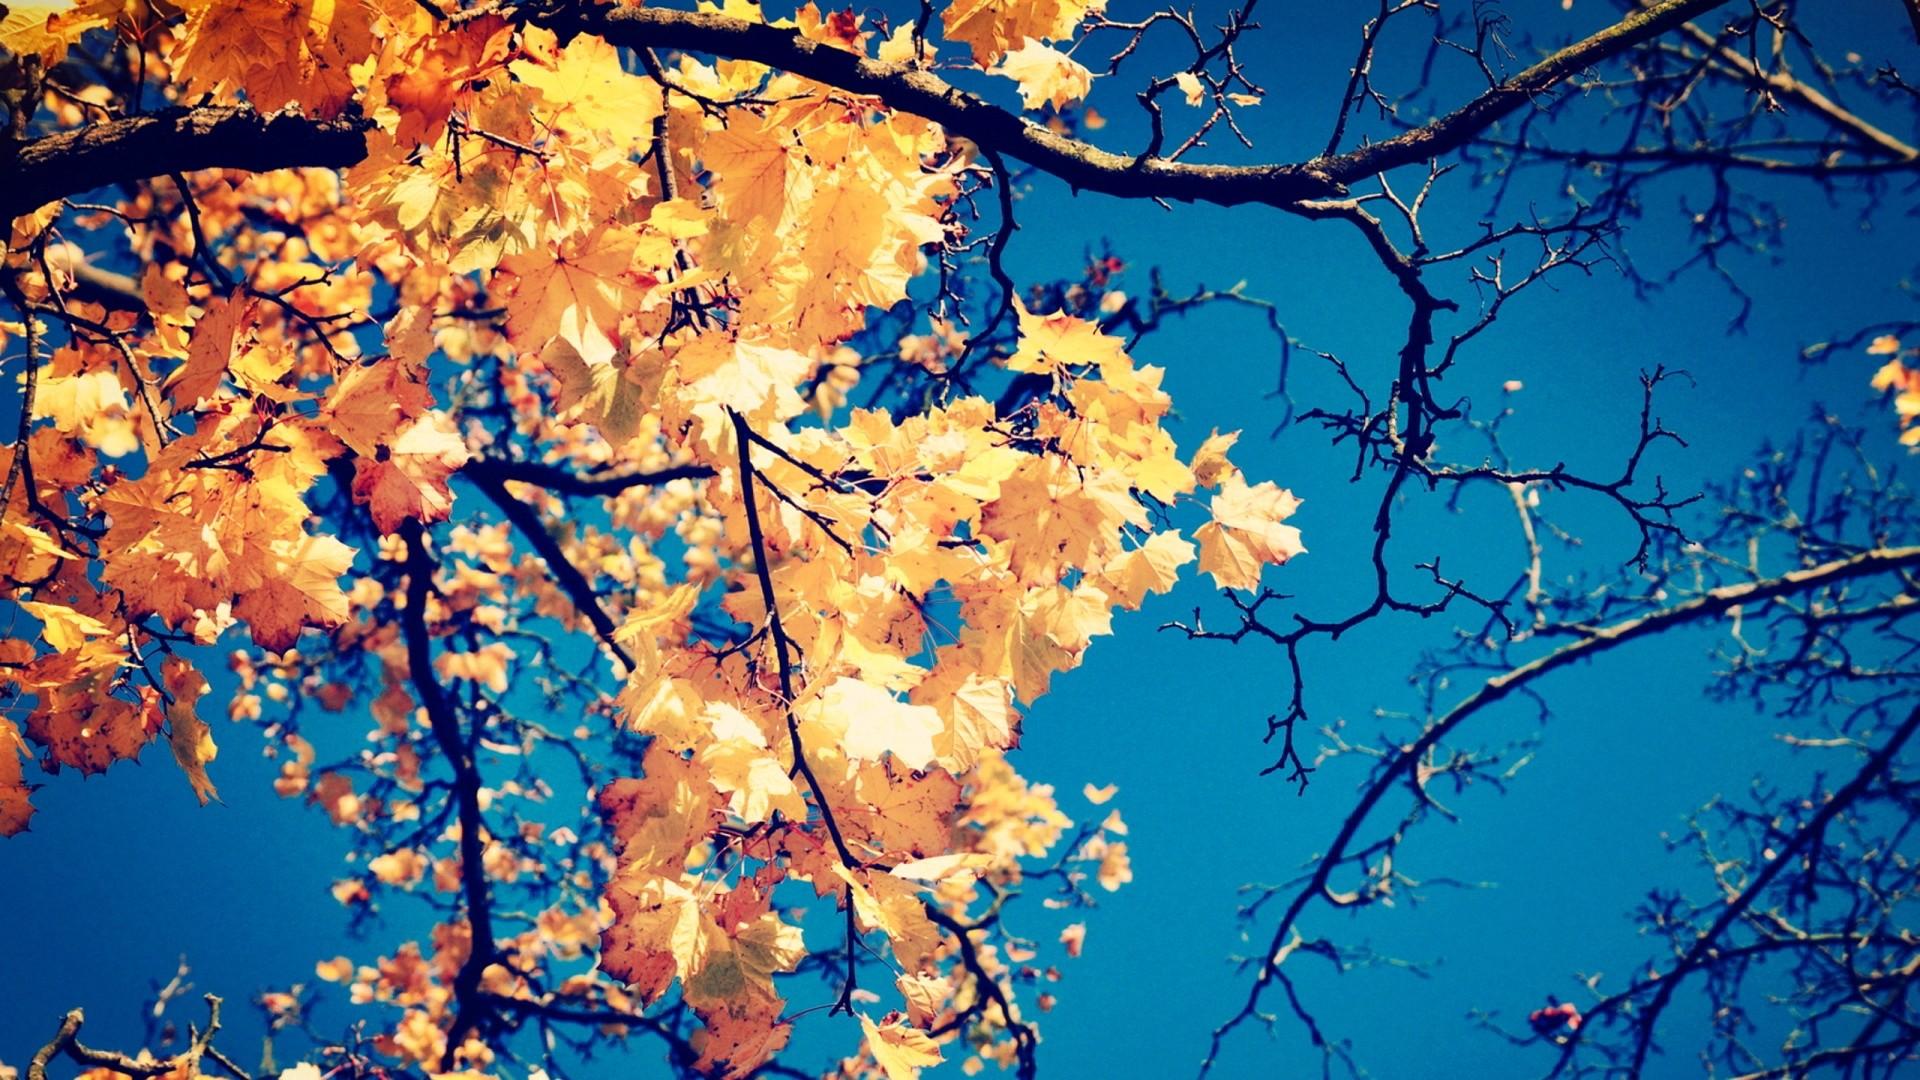 Pumpkin And Autumn Leaves K Hd Desktop Wallpaper For K Ultra Hd